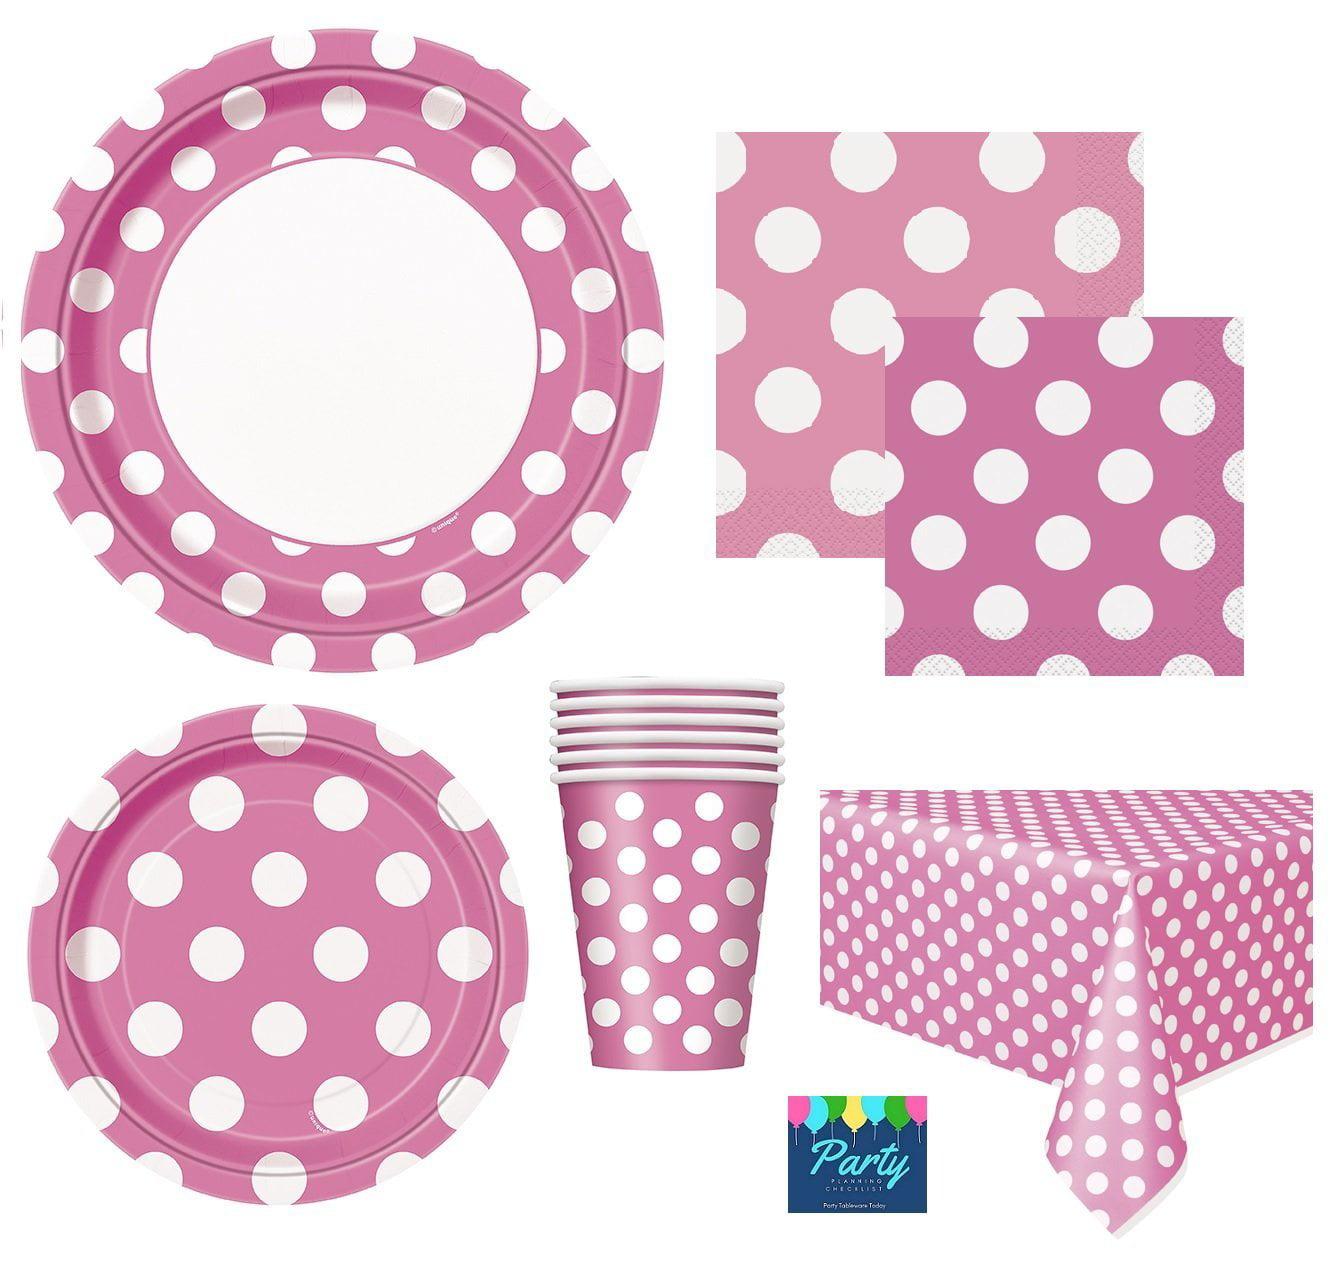 Hot Pink Polka Dot Party Beverage Napkins 3 pack of 16 ct